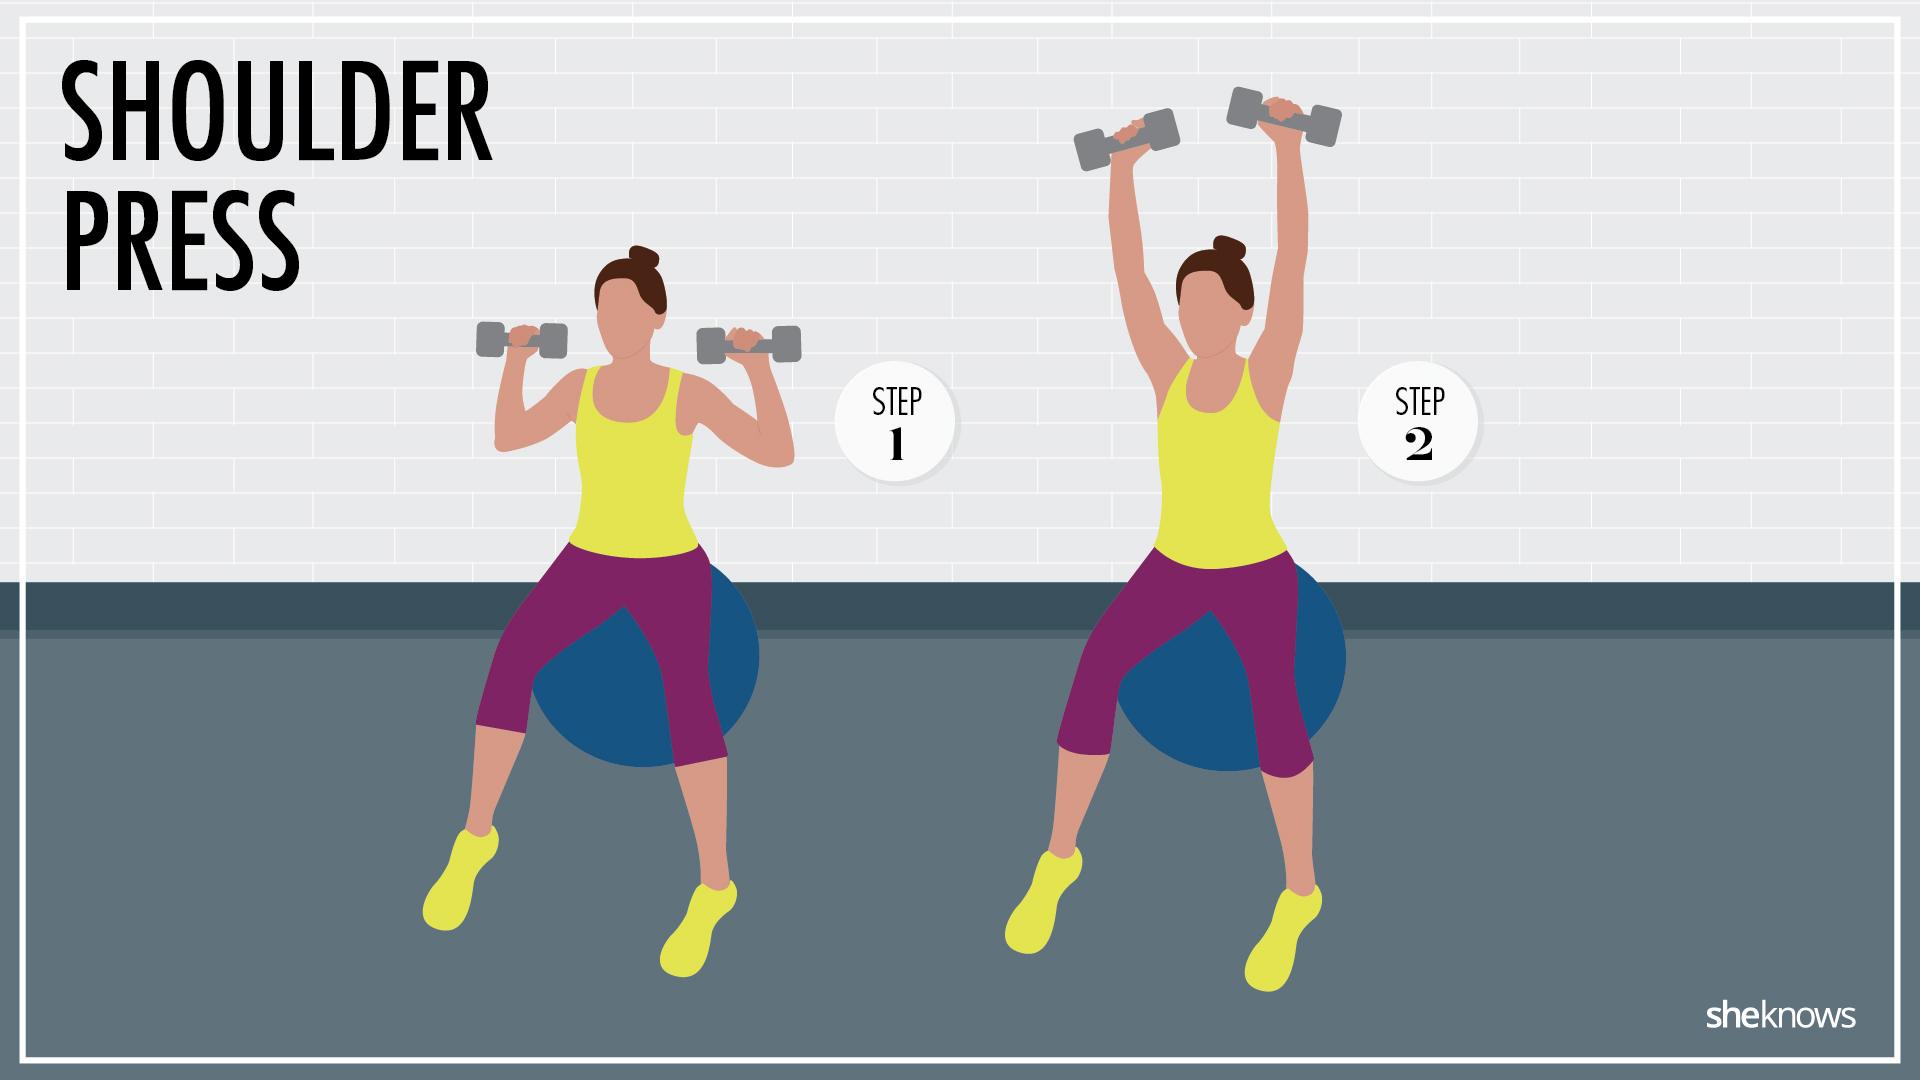 Unstable shoulder press